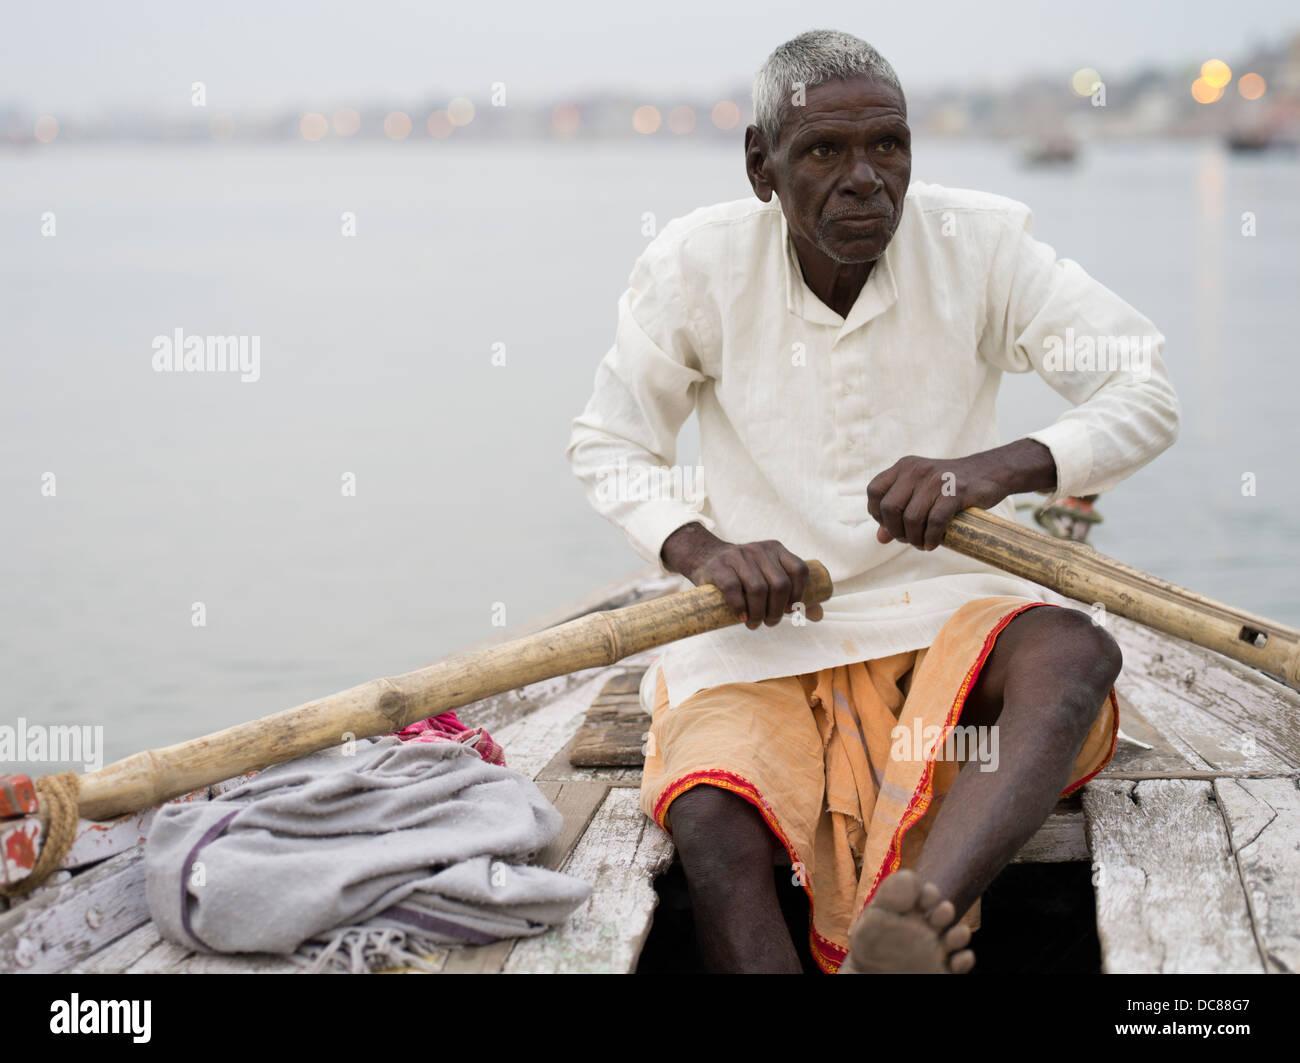 Boatman rowing on the Ganges River - Varanasi, India - Stock Image